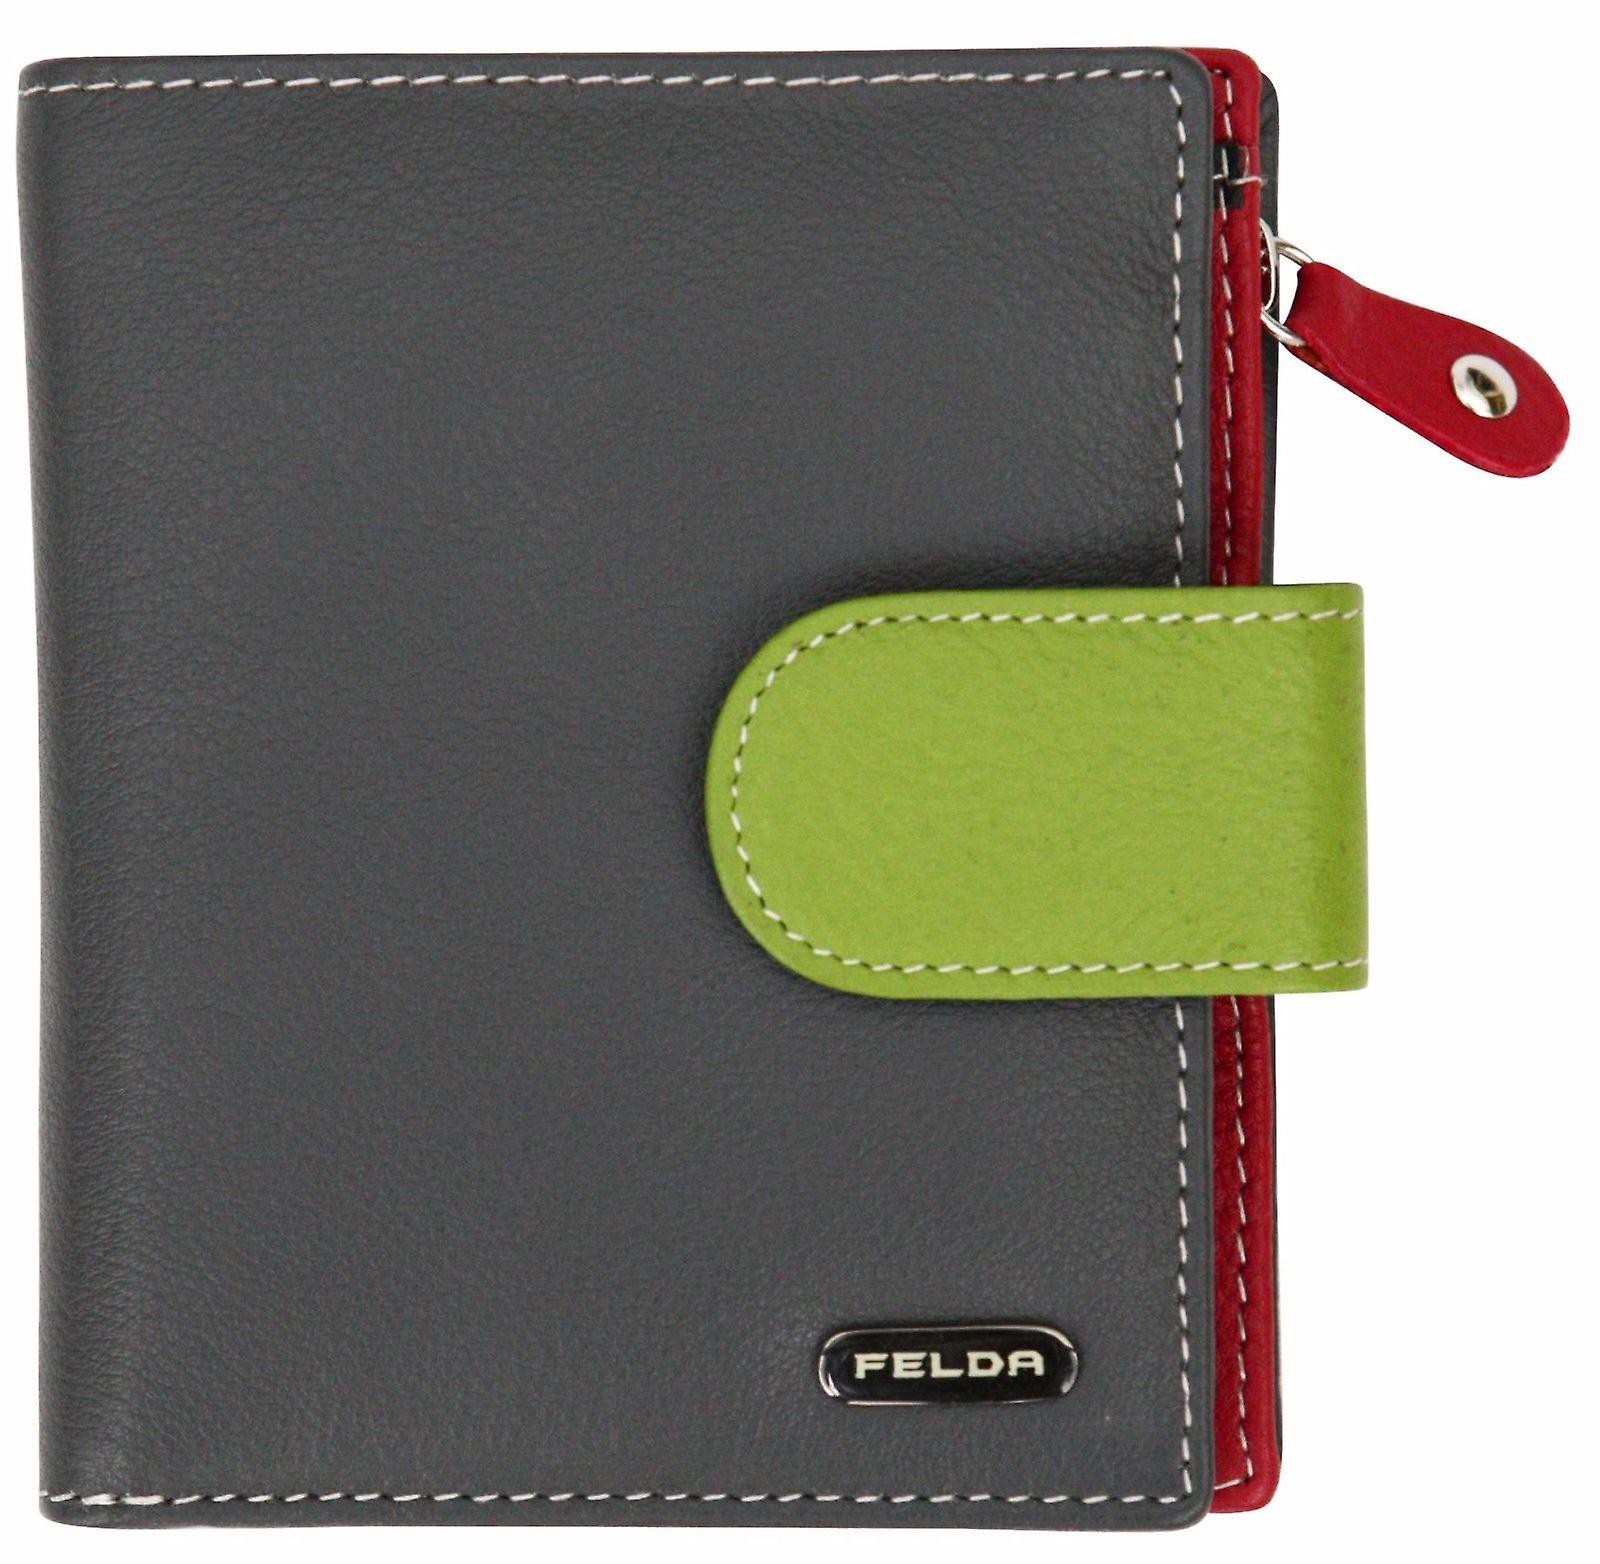 Felda RFID Ladies Coin & Card Purse Wallet Genuine Leather Multi Soft Gift Box